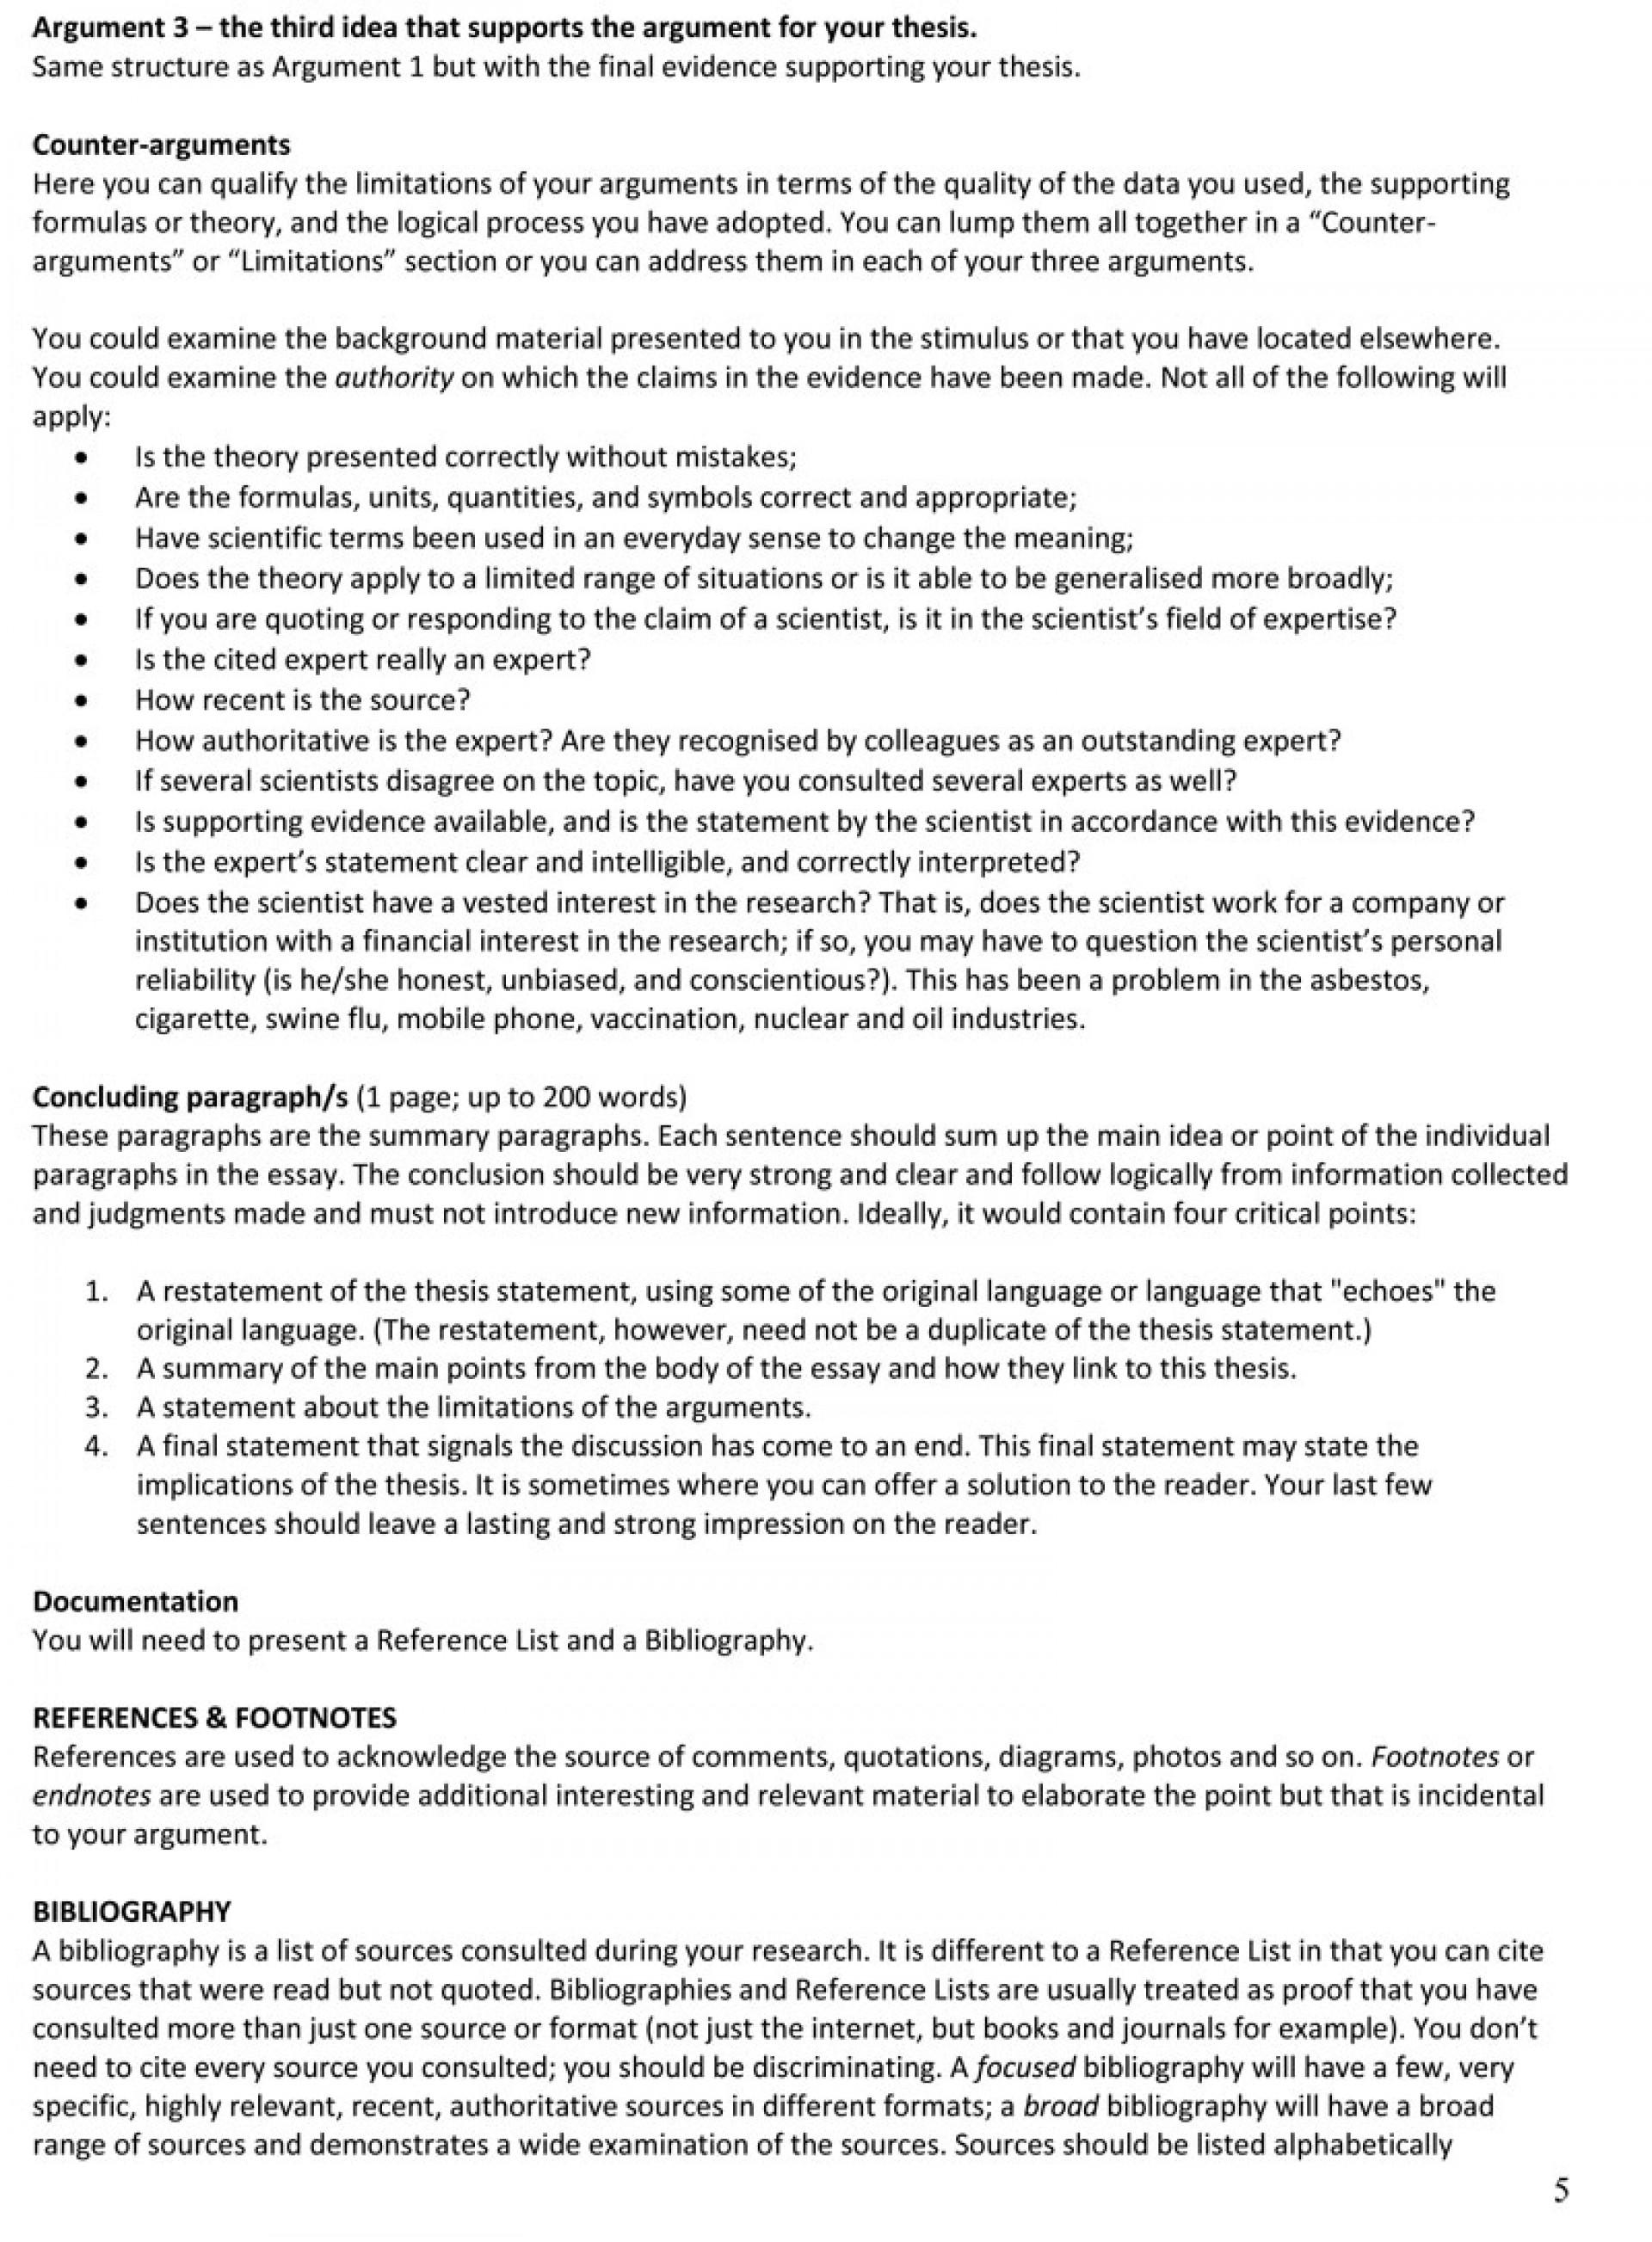 018 Counter Argument Essay Example Argumentative For Abortion Conclusion Persuasive Ert Biol Gu Beautiful Examples Sample 1920